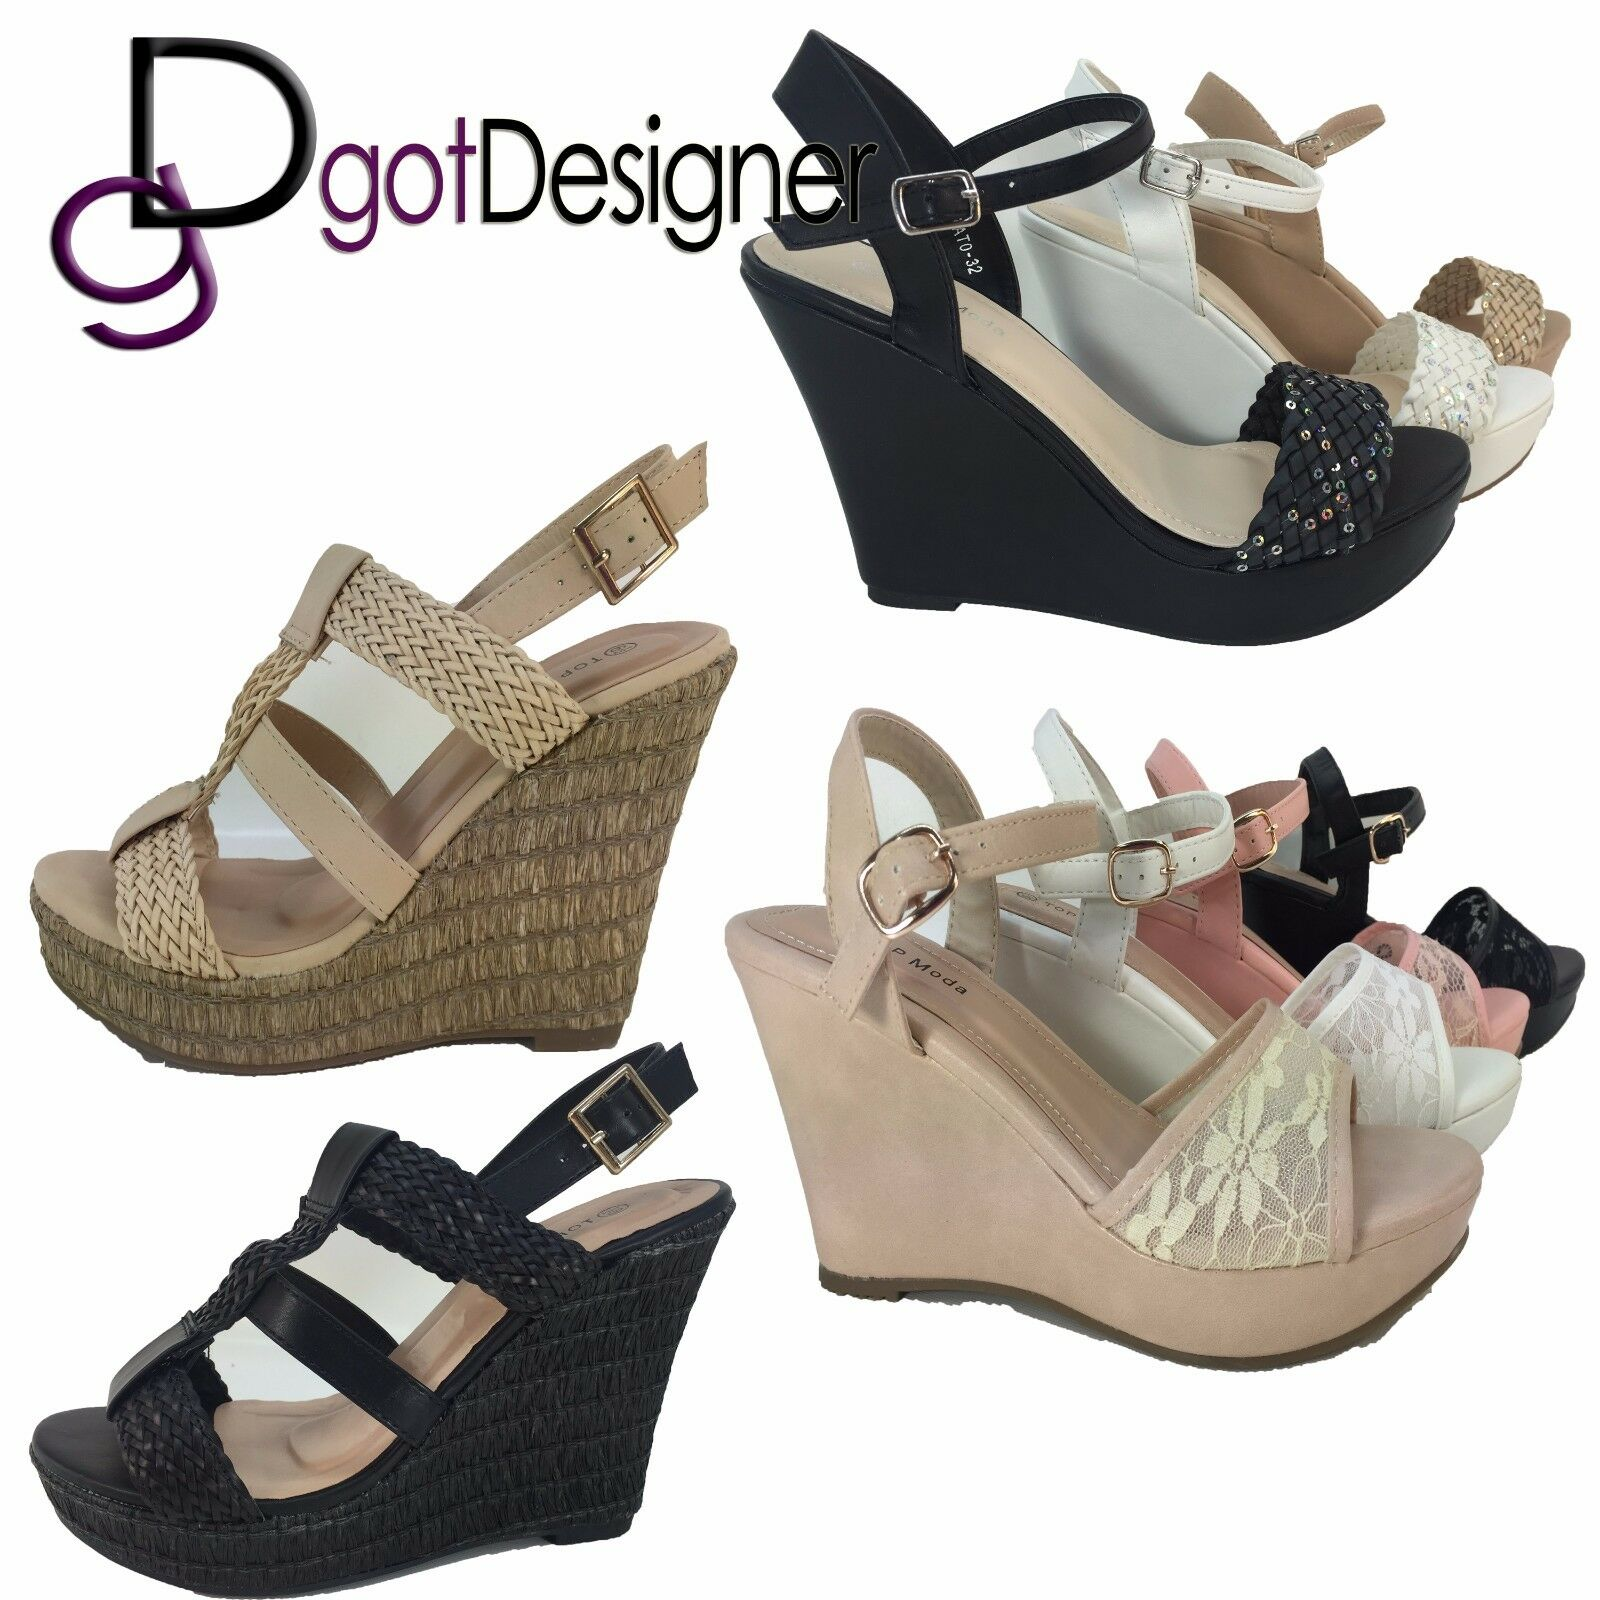 Women's Fashion High Heel Cork Wedge Cork Heel Sandal Platform Open Toe Strappy New Pumps c8833c